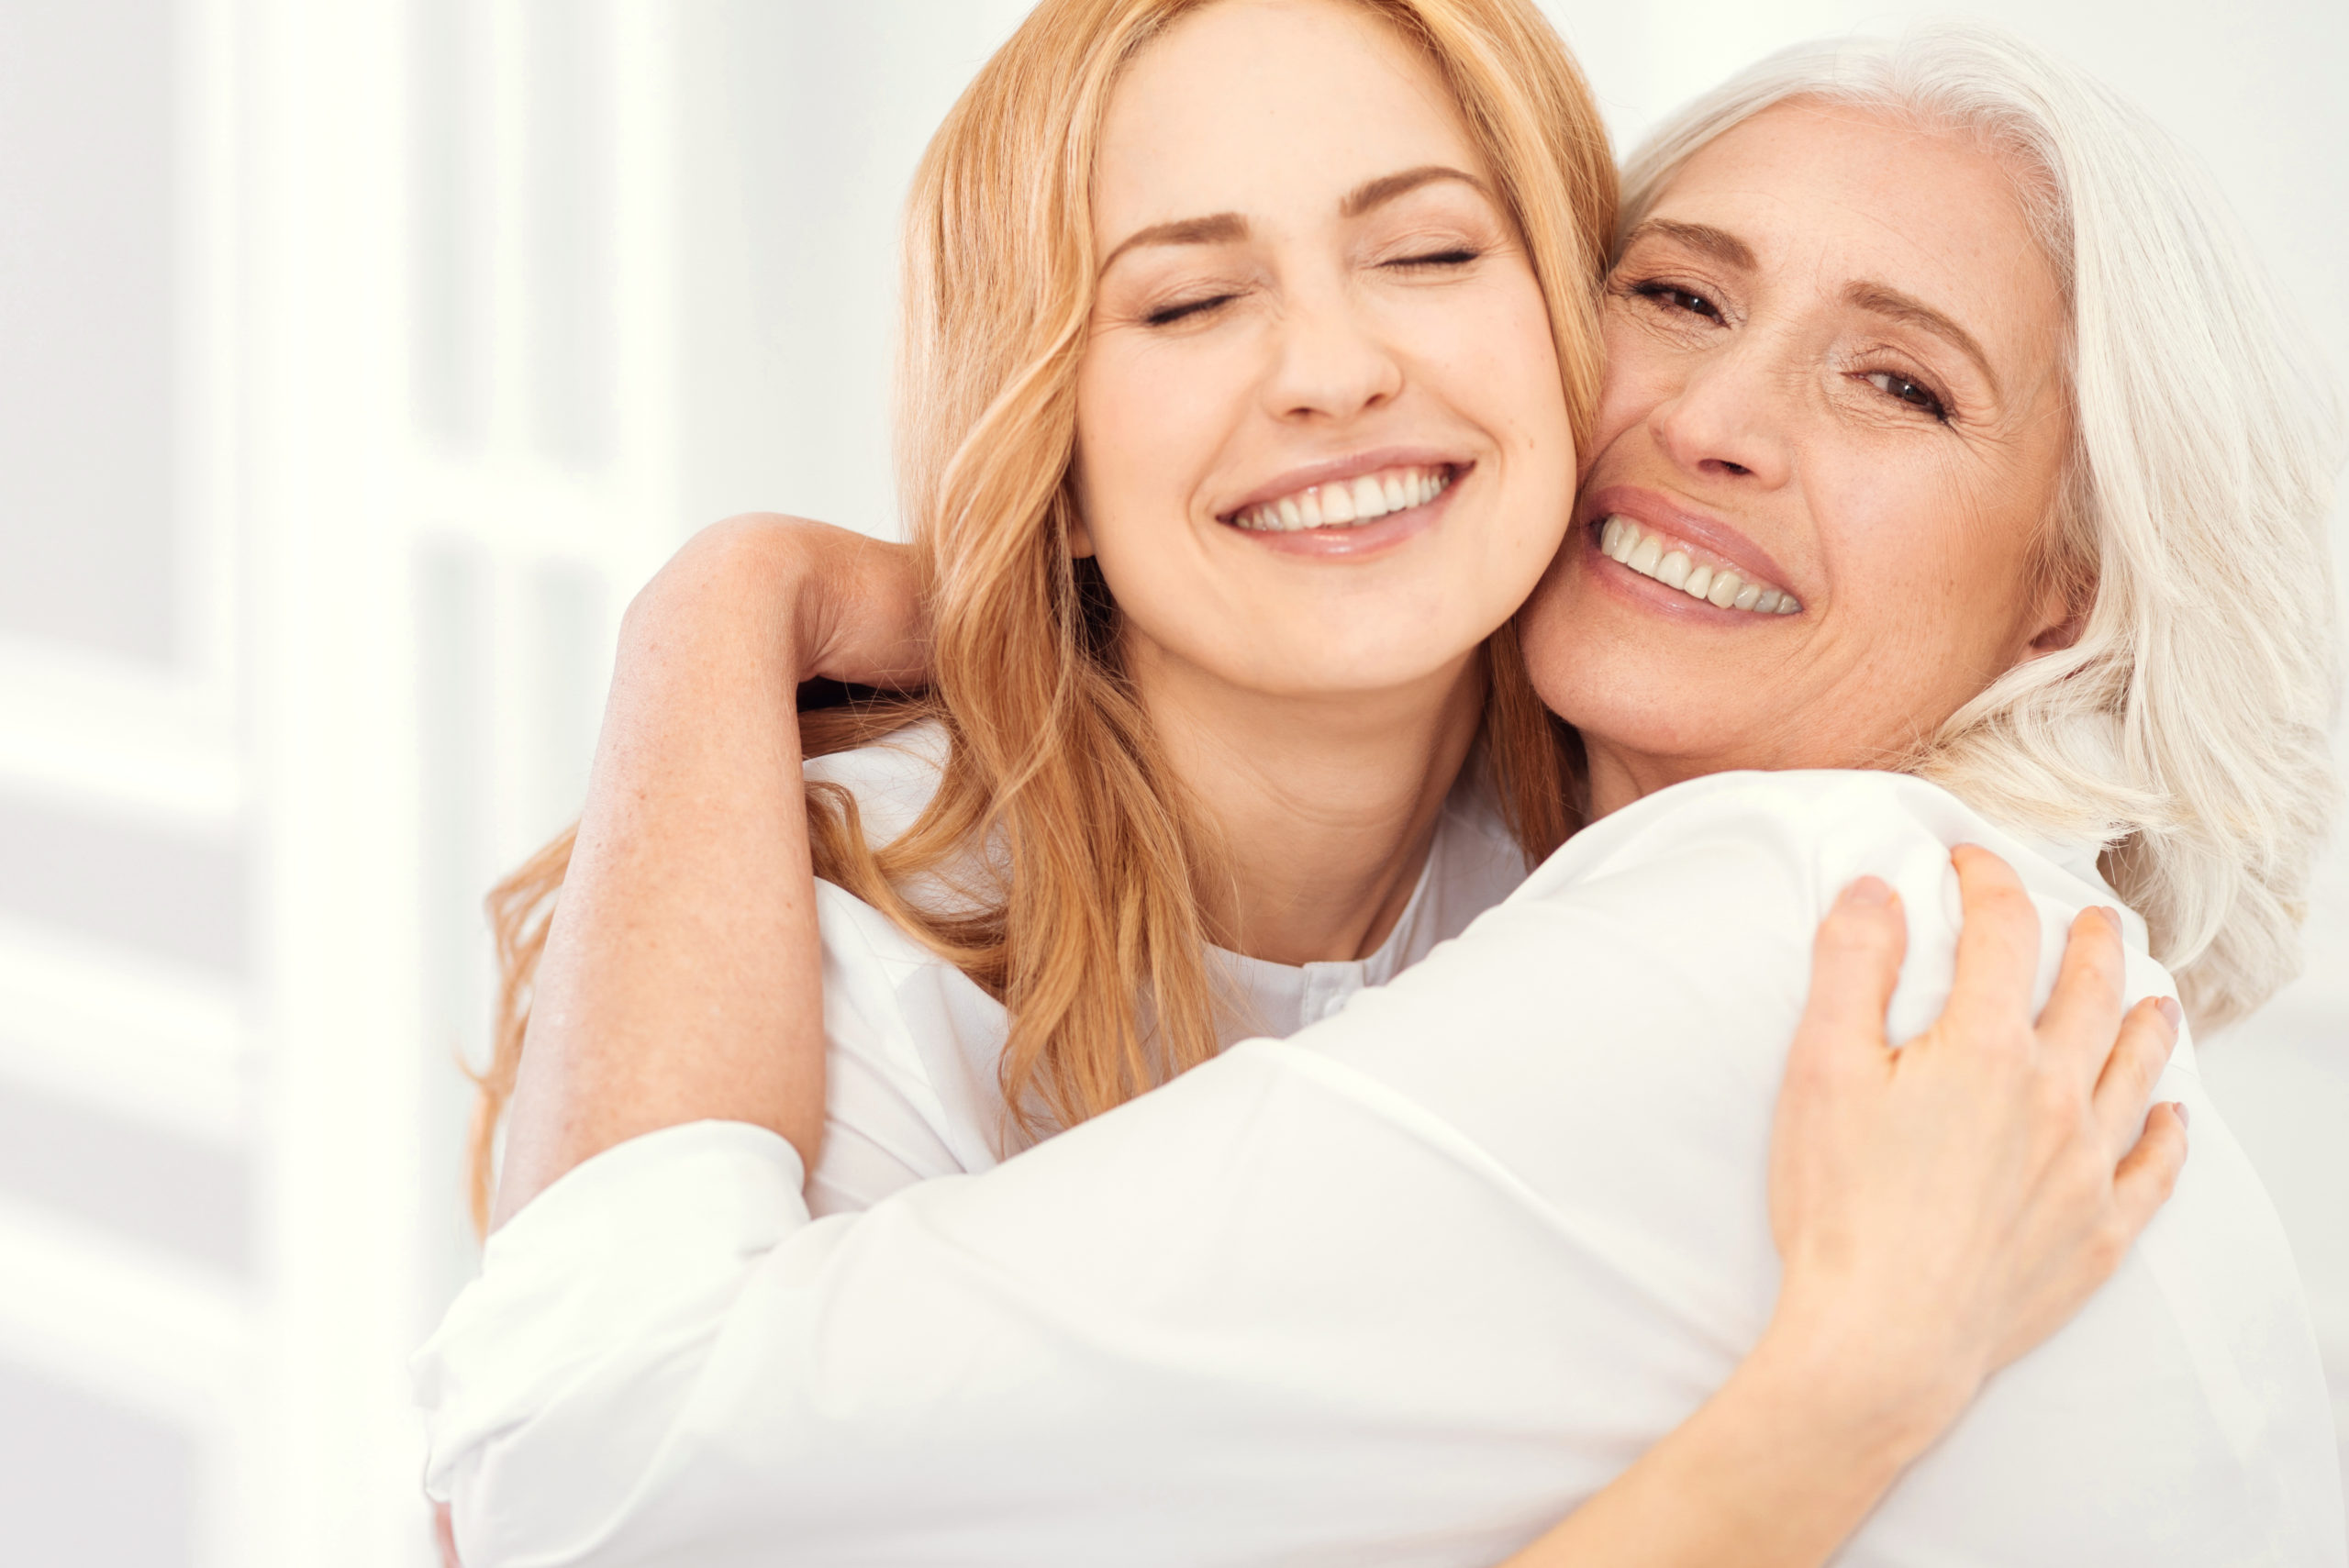 femmes sourire